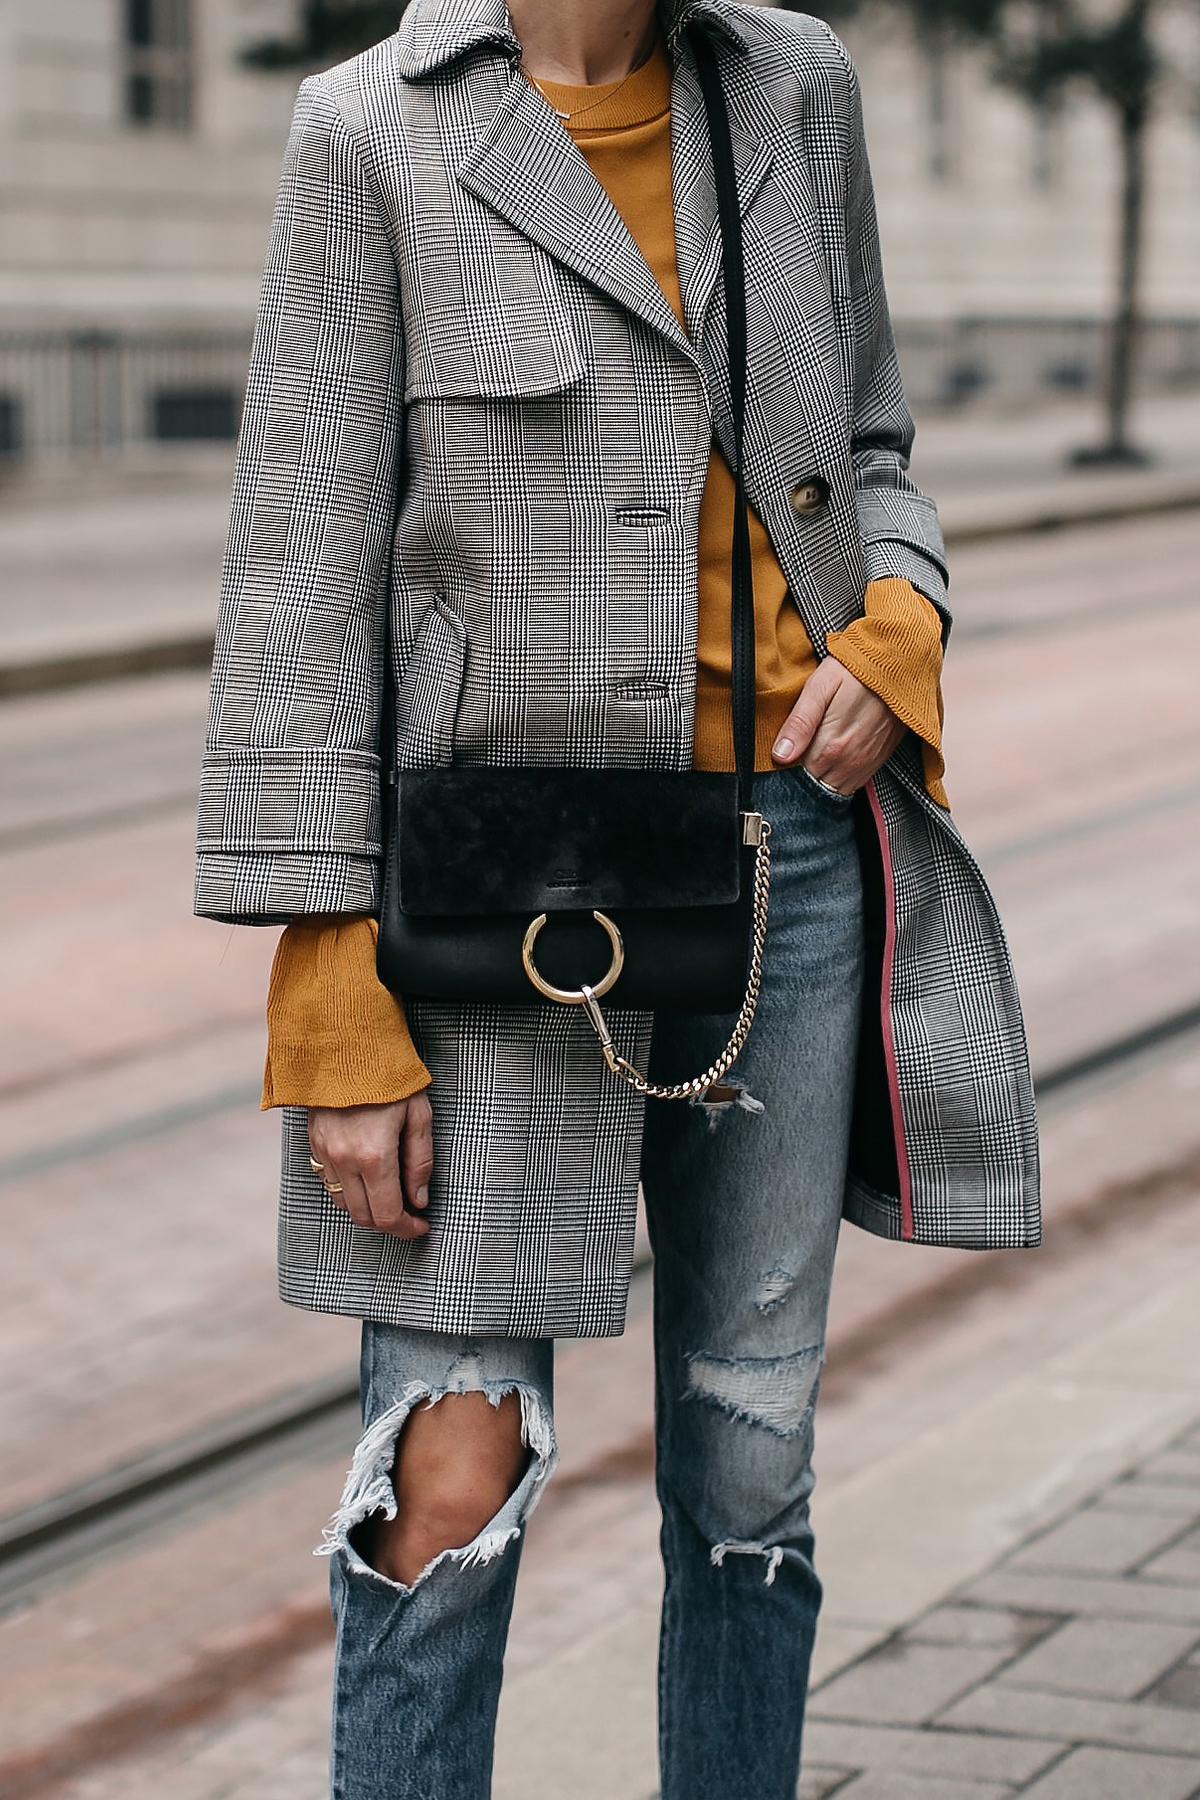 Topshop Plaid Trench Coat Marigold Sweater Levis Ripped Jeans Chloe Faye Handbag Fashion Jackson Dallas Blogger Fashion Blogger Street Style